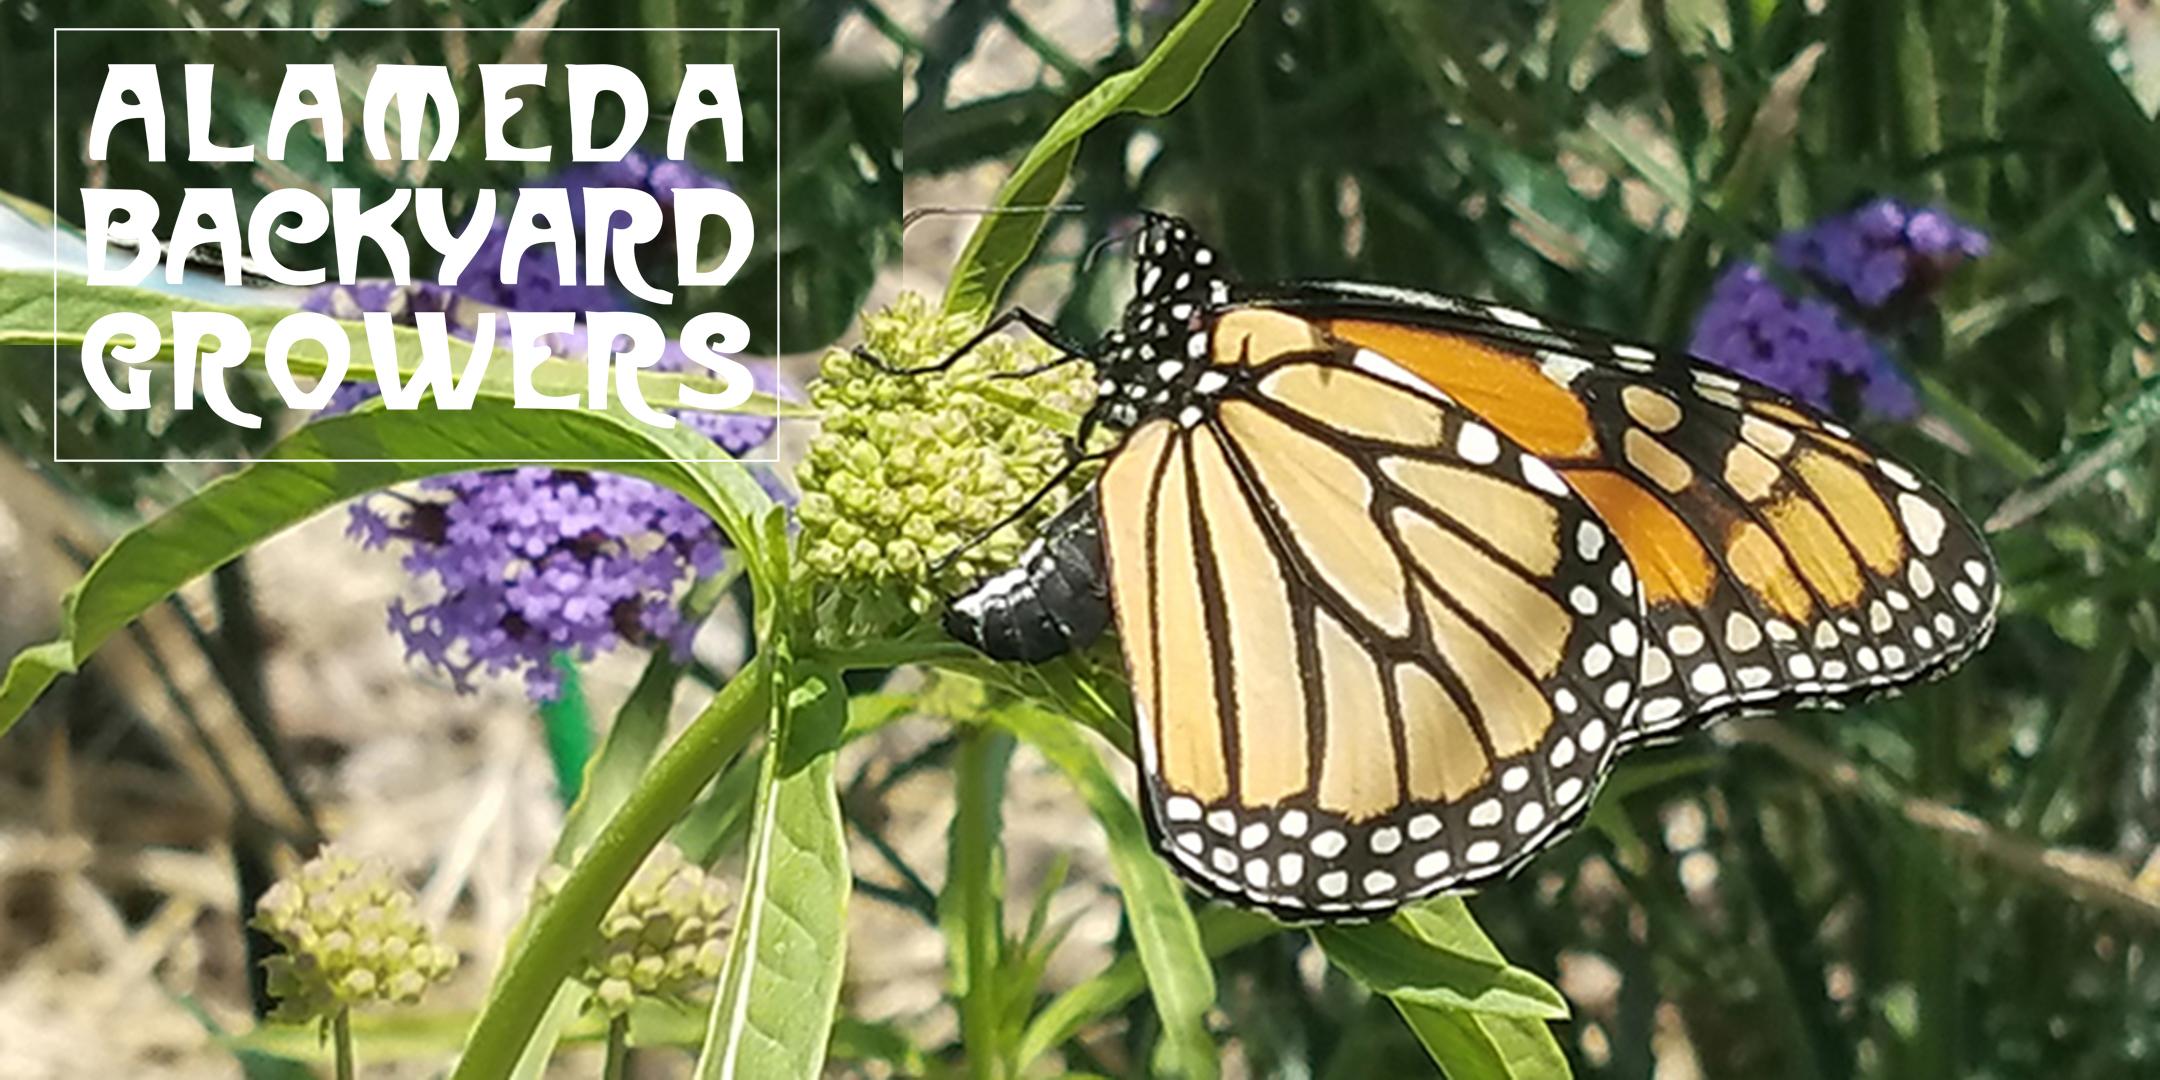 save-monarchs-in-alameda-eventbrite - Alameda Backyard Growers